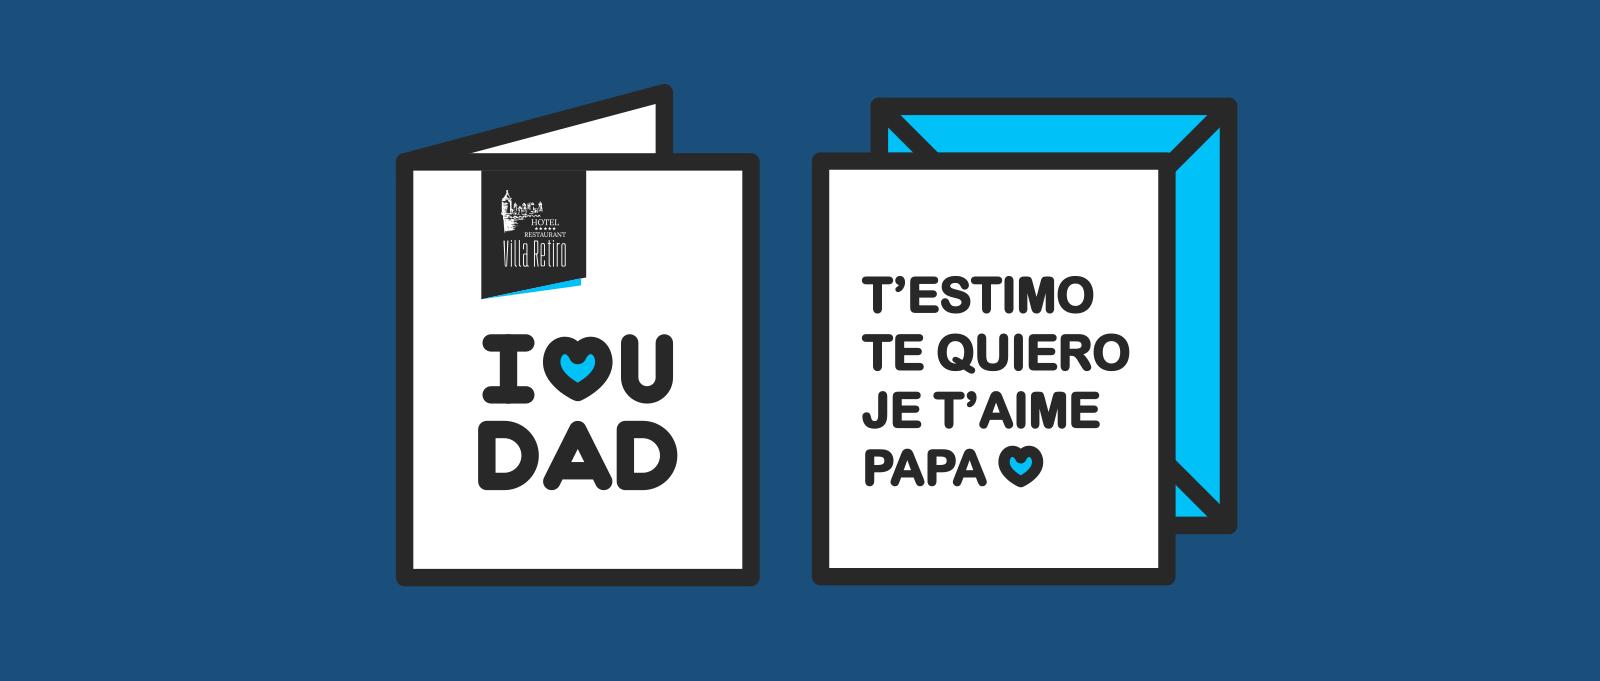 I❤U DAD - Día del Padre - Restaurante Villa Retiro